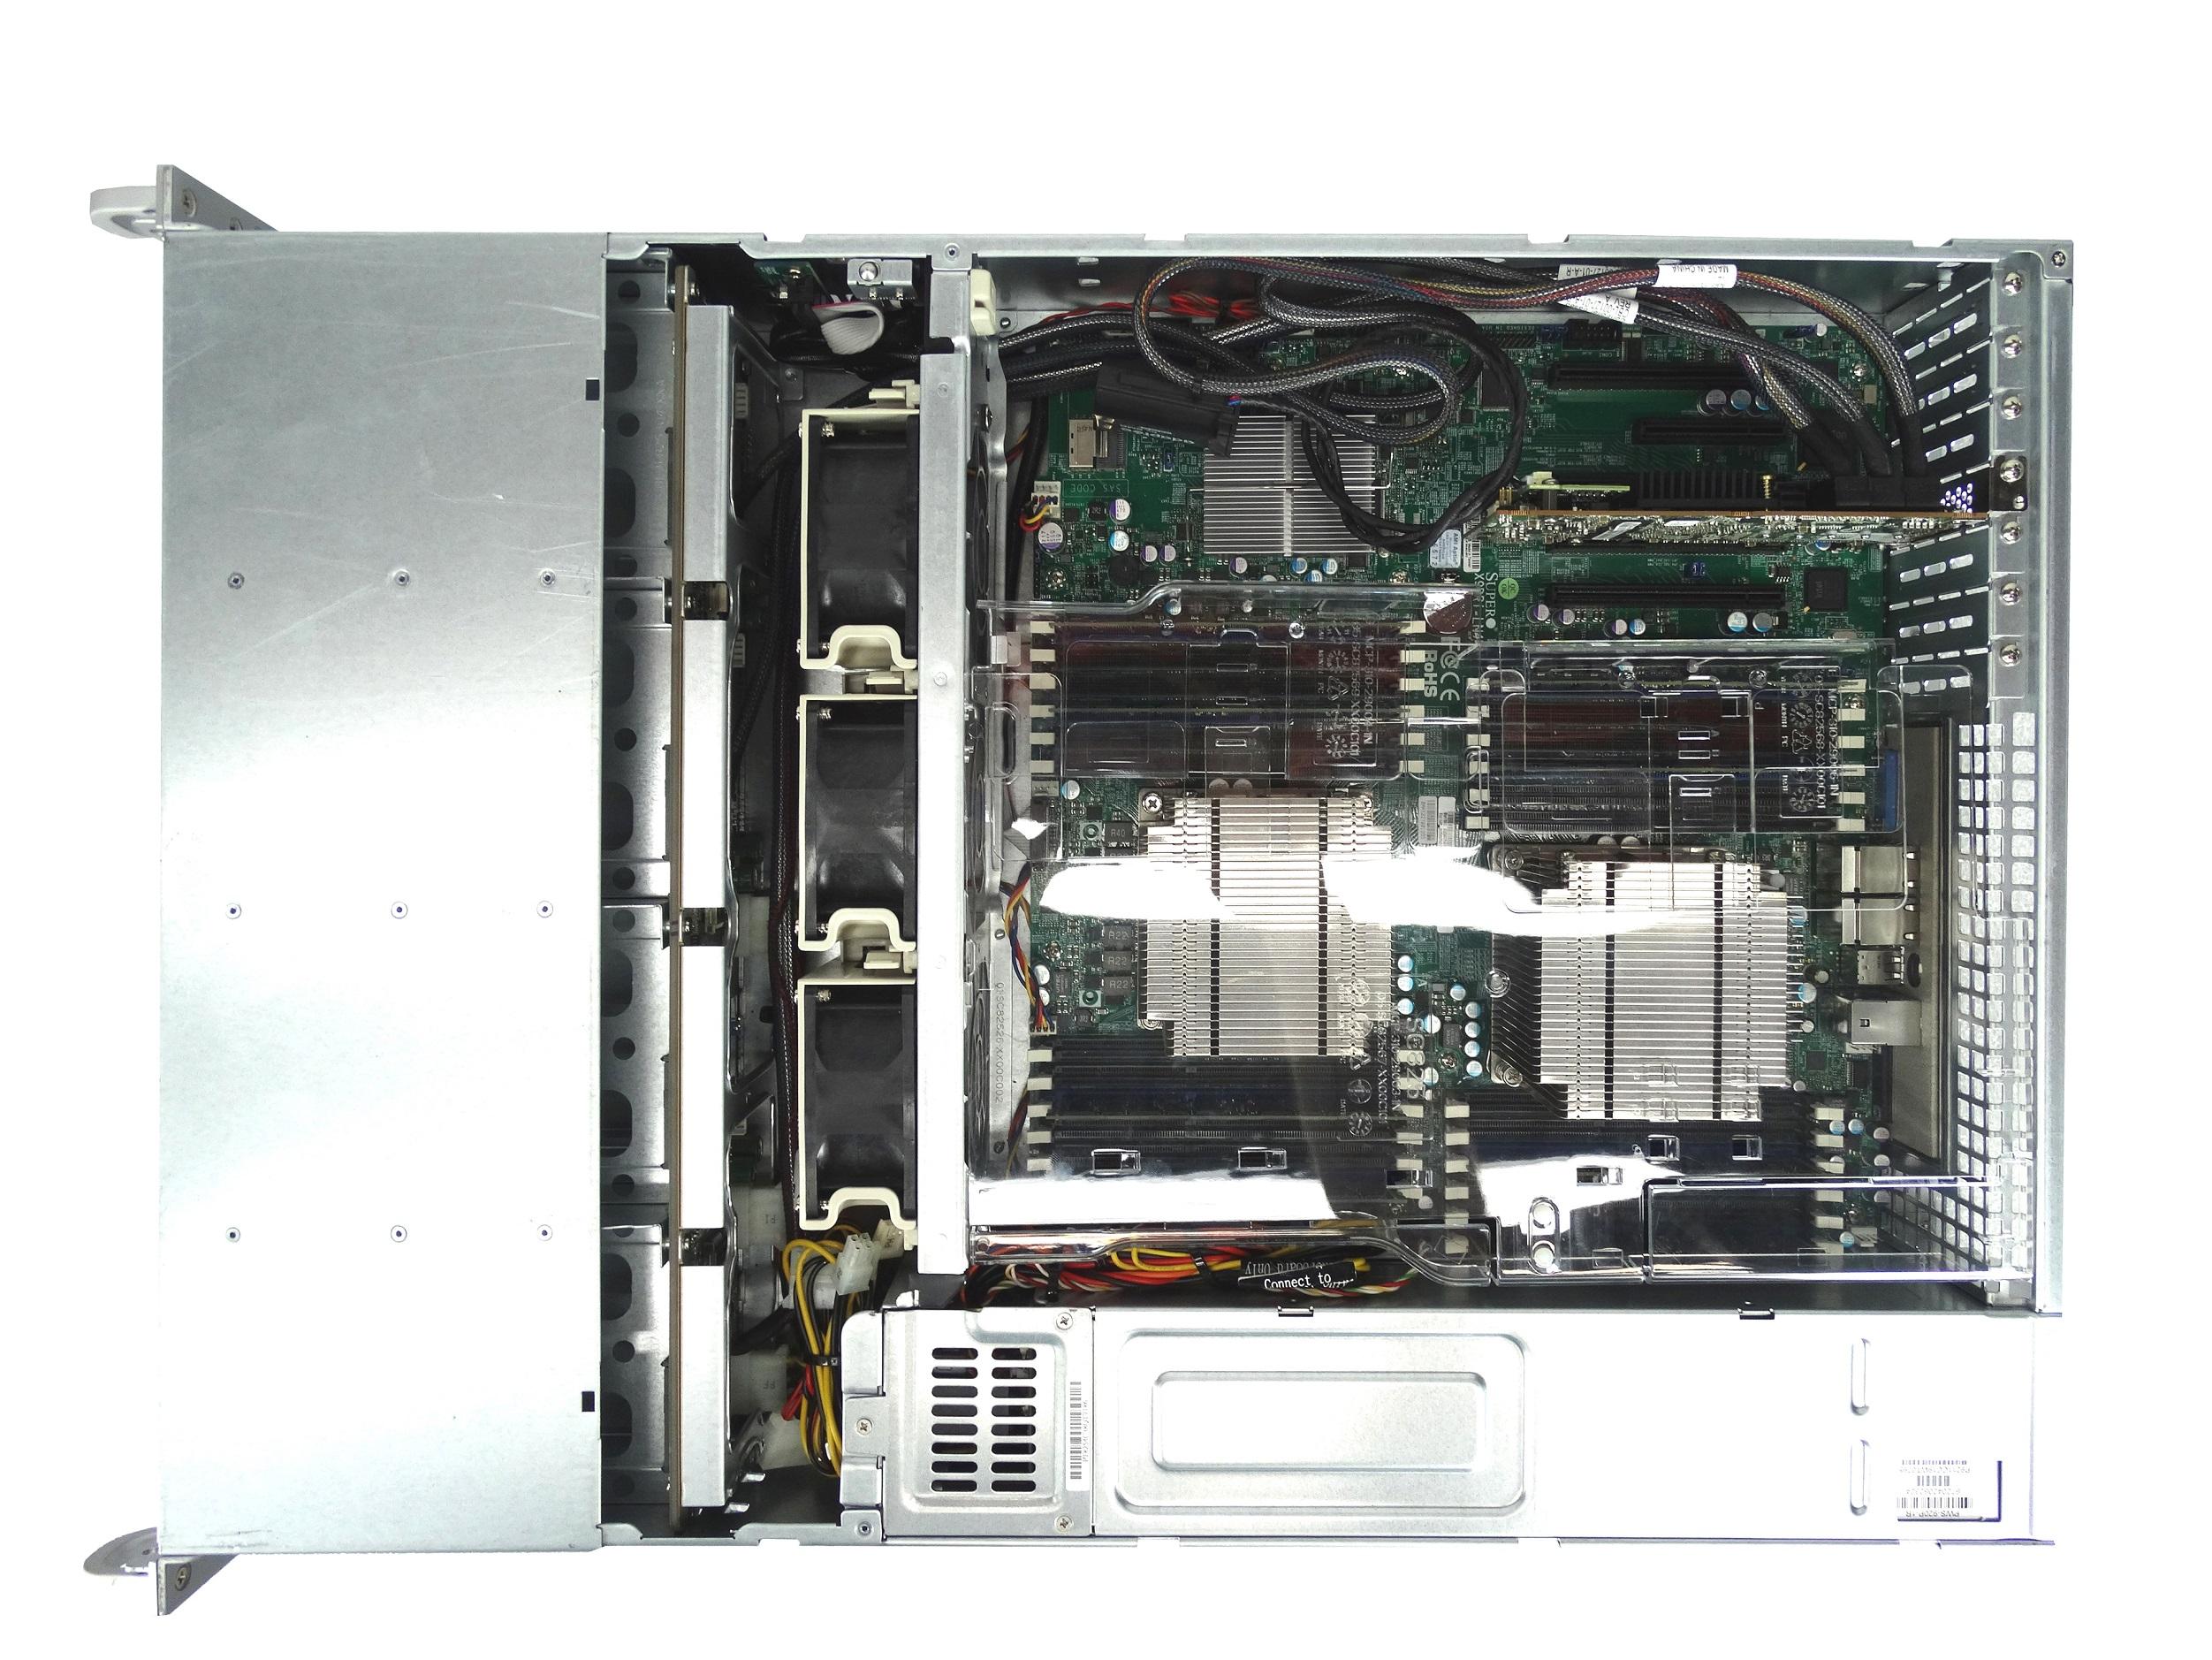 Supermicro SuperServer 6027R 12-Bay LFF 2U Rackmount Server with  X9DRi-LN4F+ Motherboard